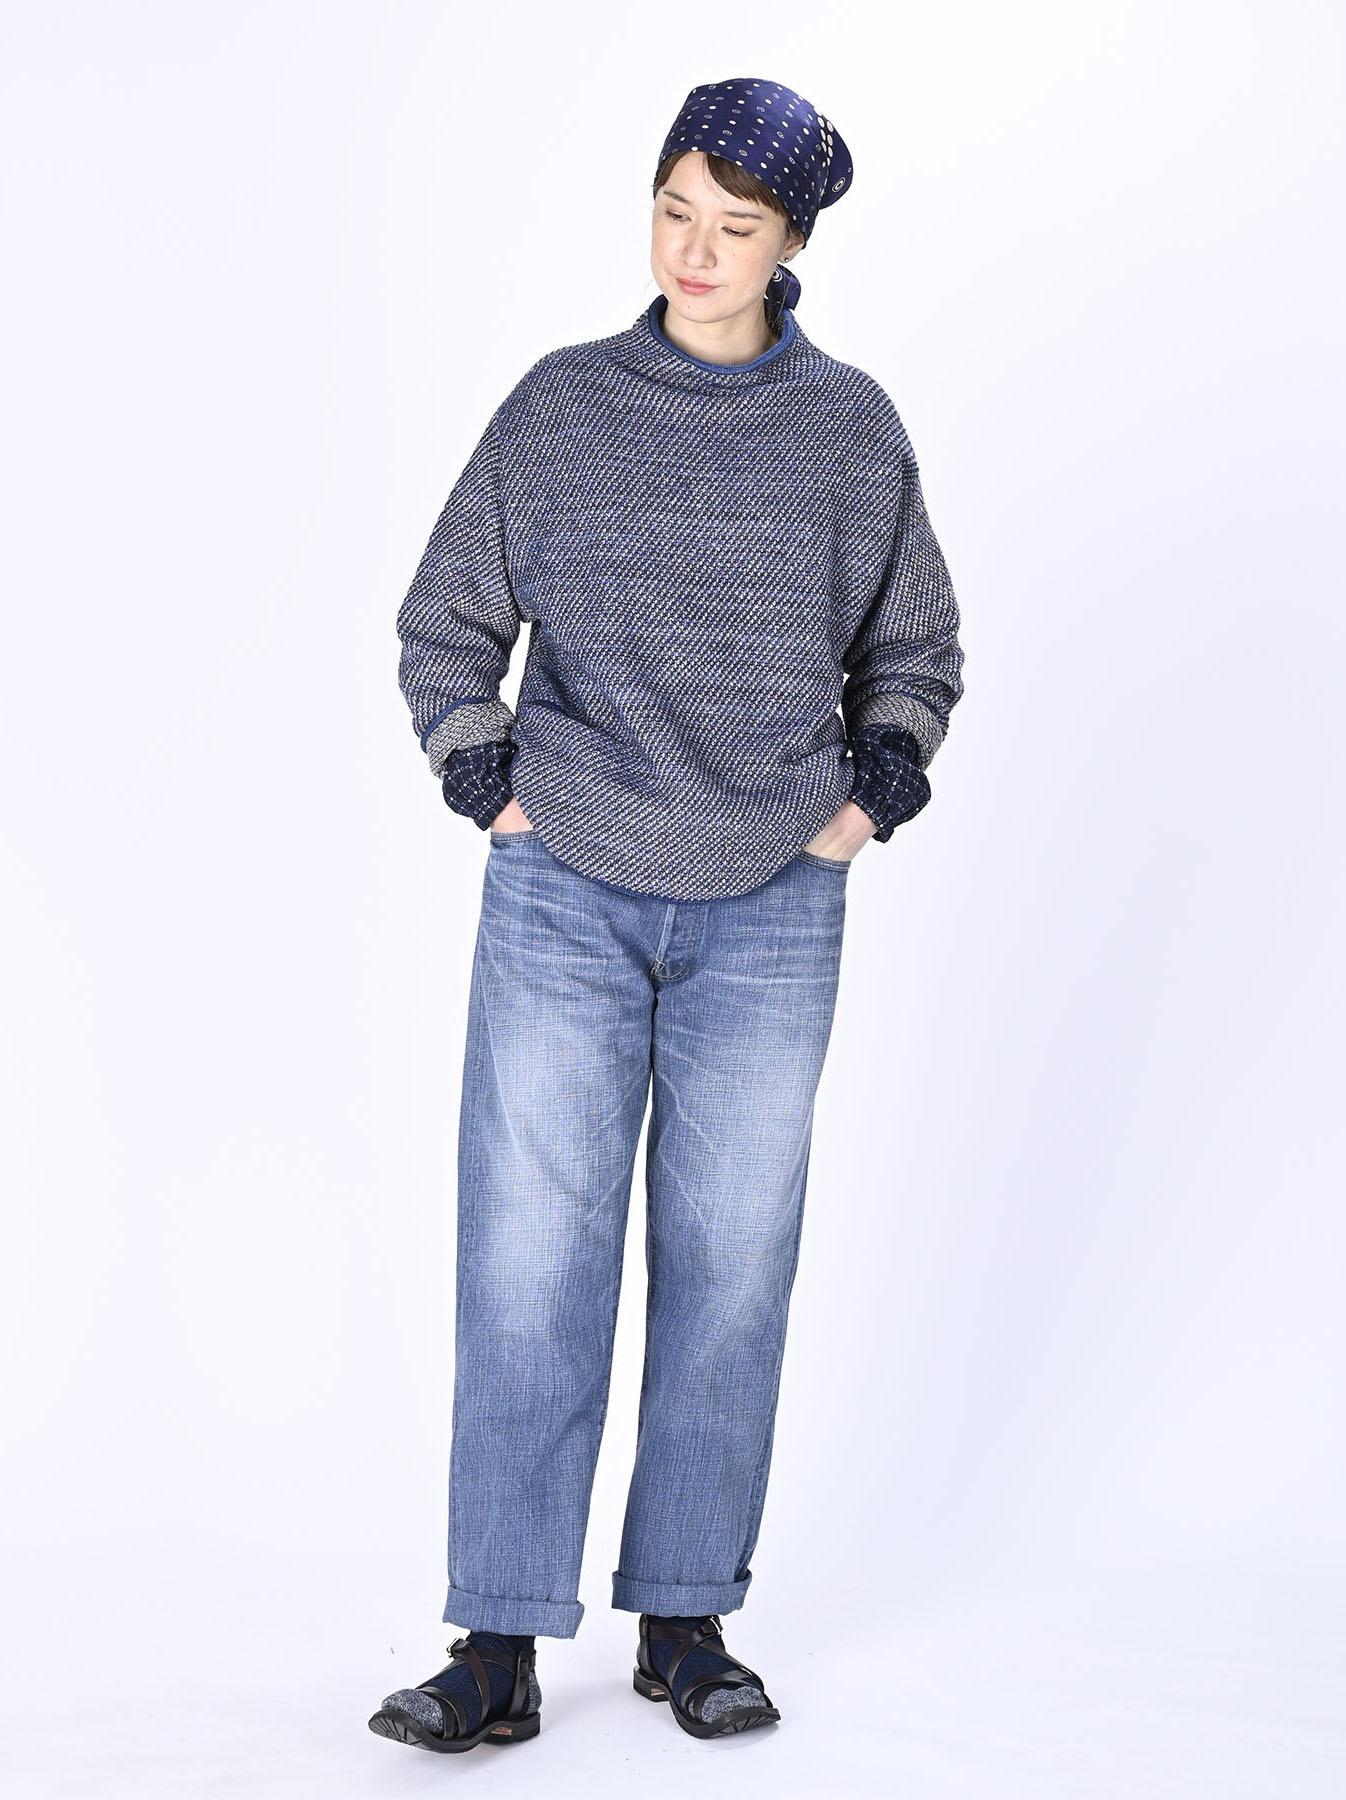 Indigo Knit Jacquard 908 Umahiko Sweater-2